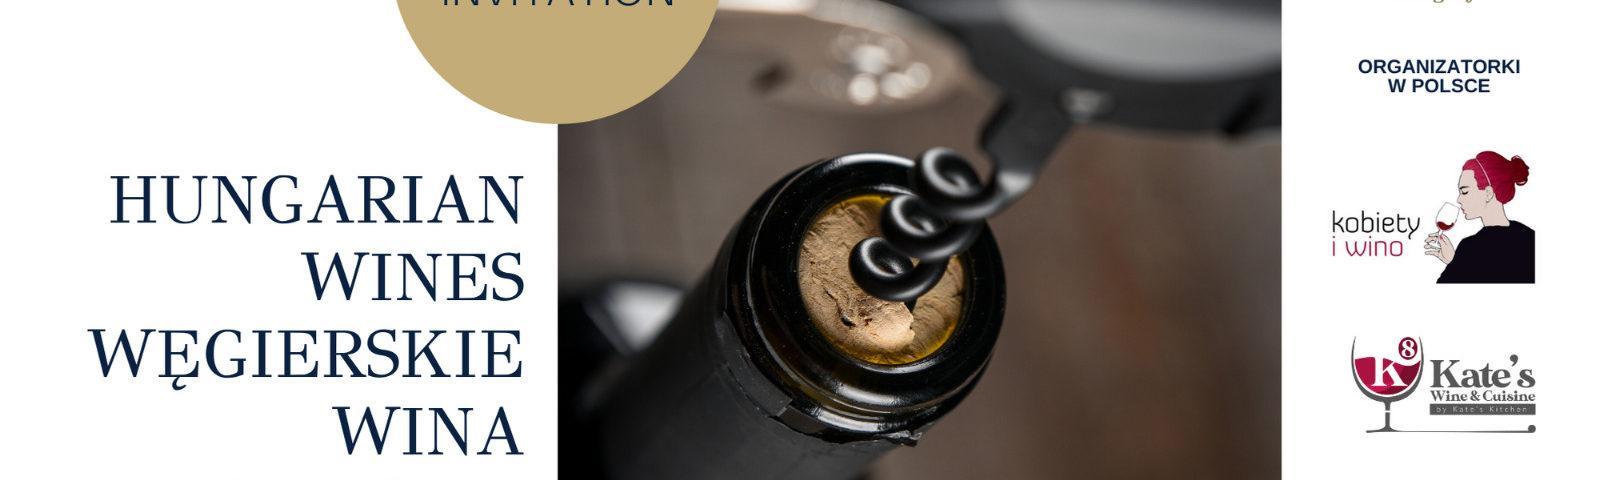 IMG 20191217 WA0082 1600x480 - Hungarian Wines - The Best Of